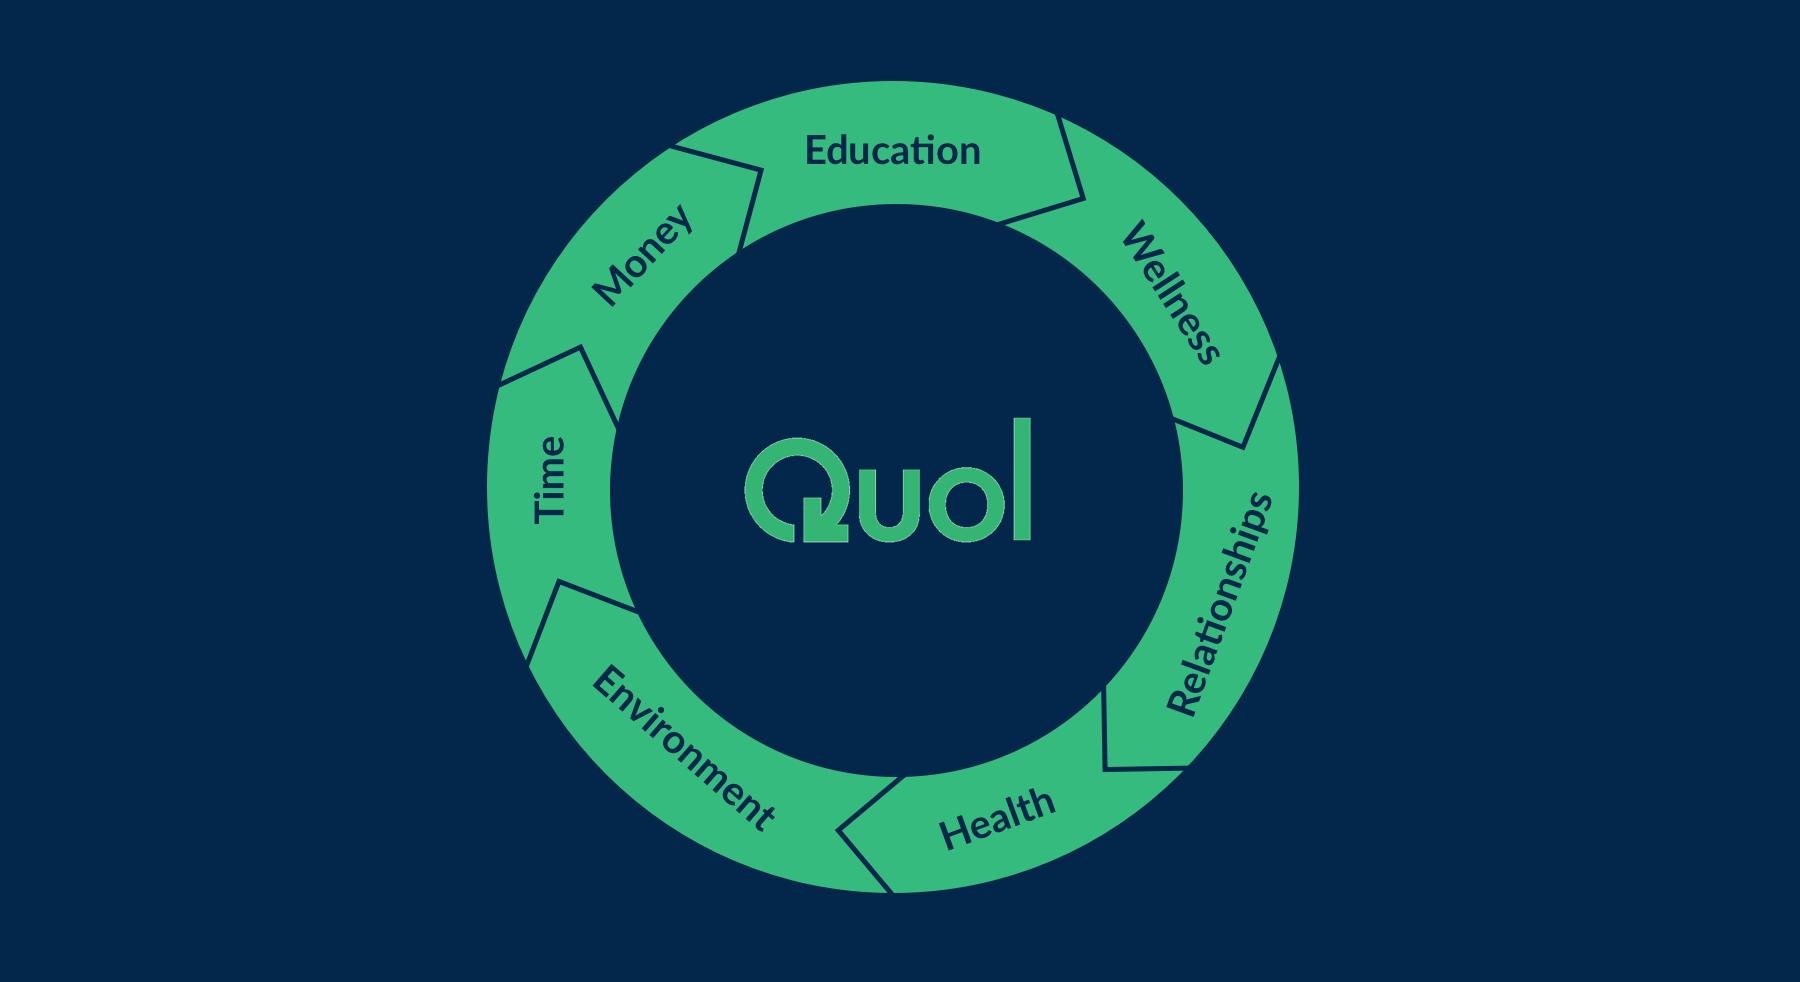 quol-diagram-ux-design-furthermore.png